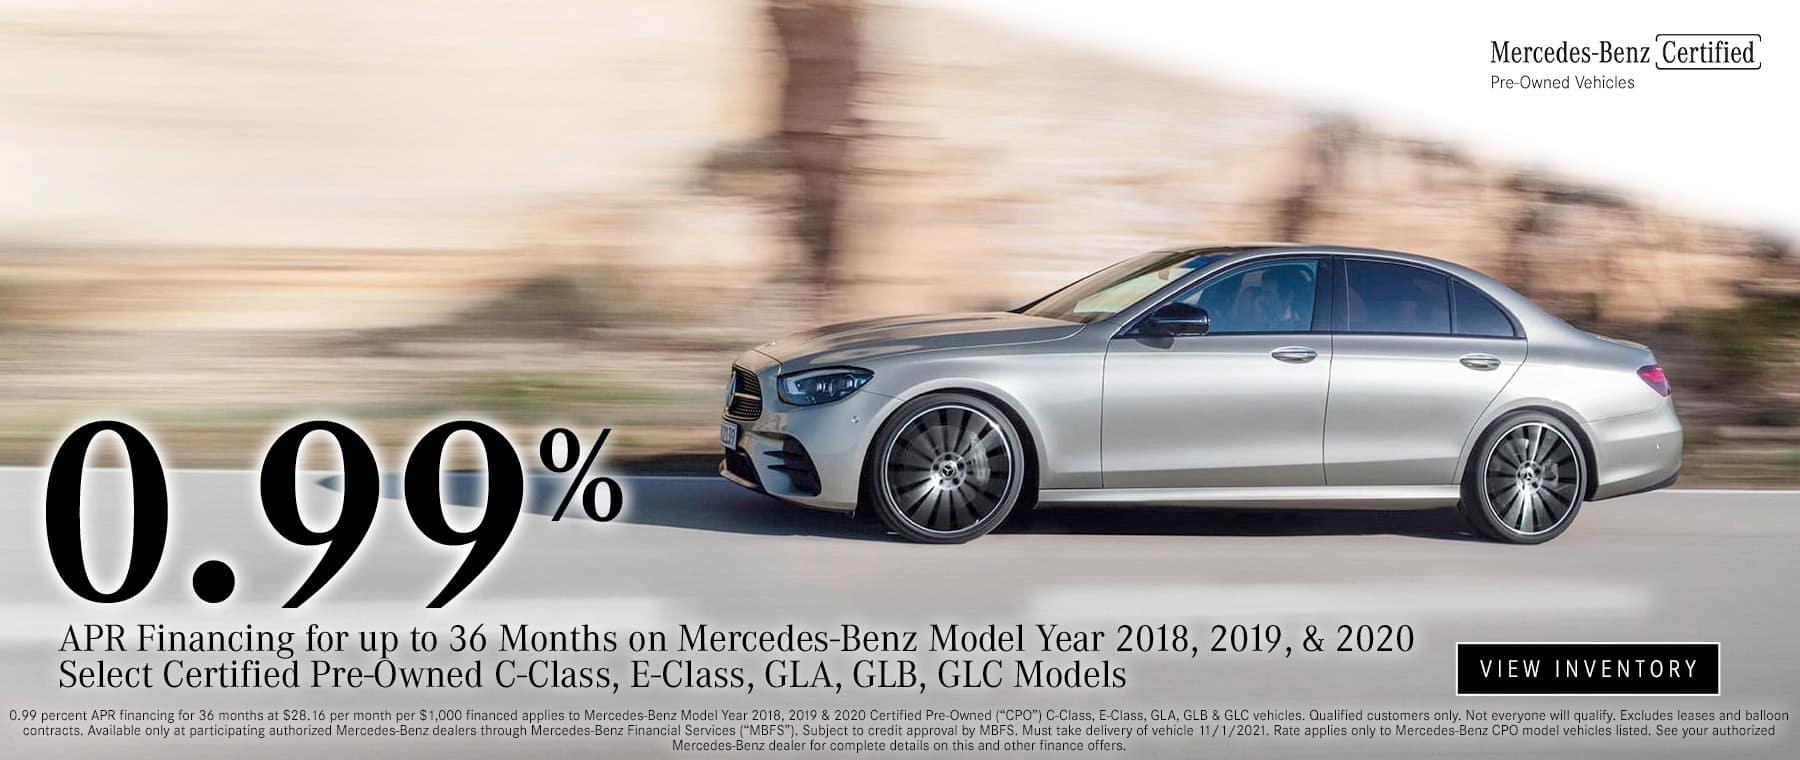 0.99% APR Financing at Mercedes Benz of South Mississippi until 11/1/2021